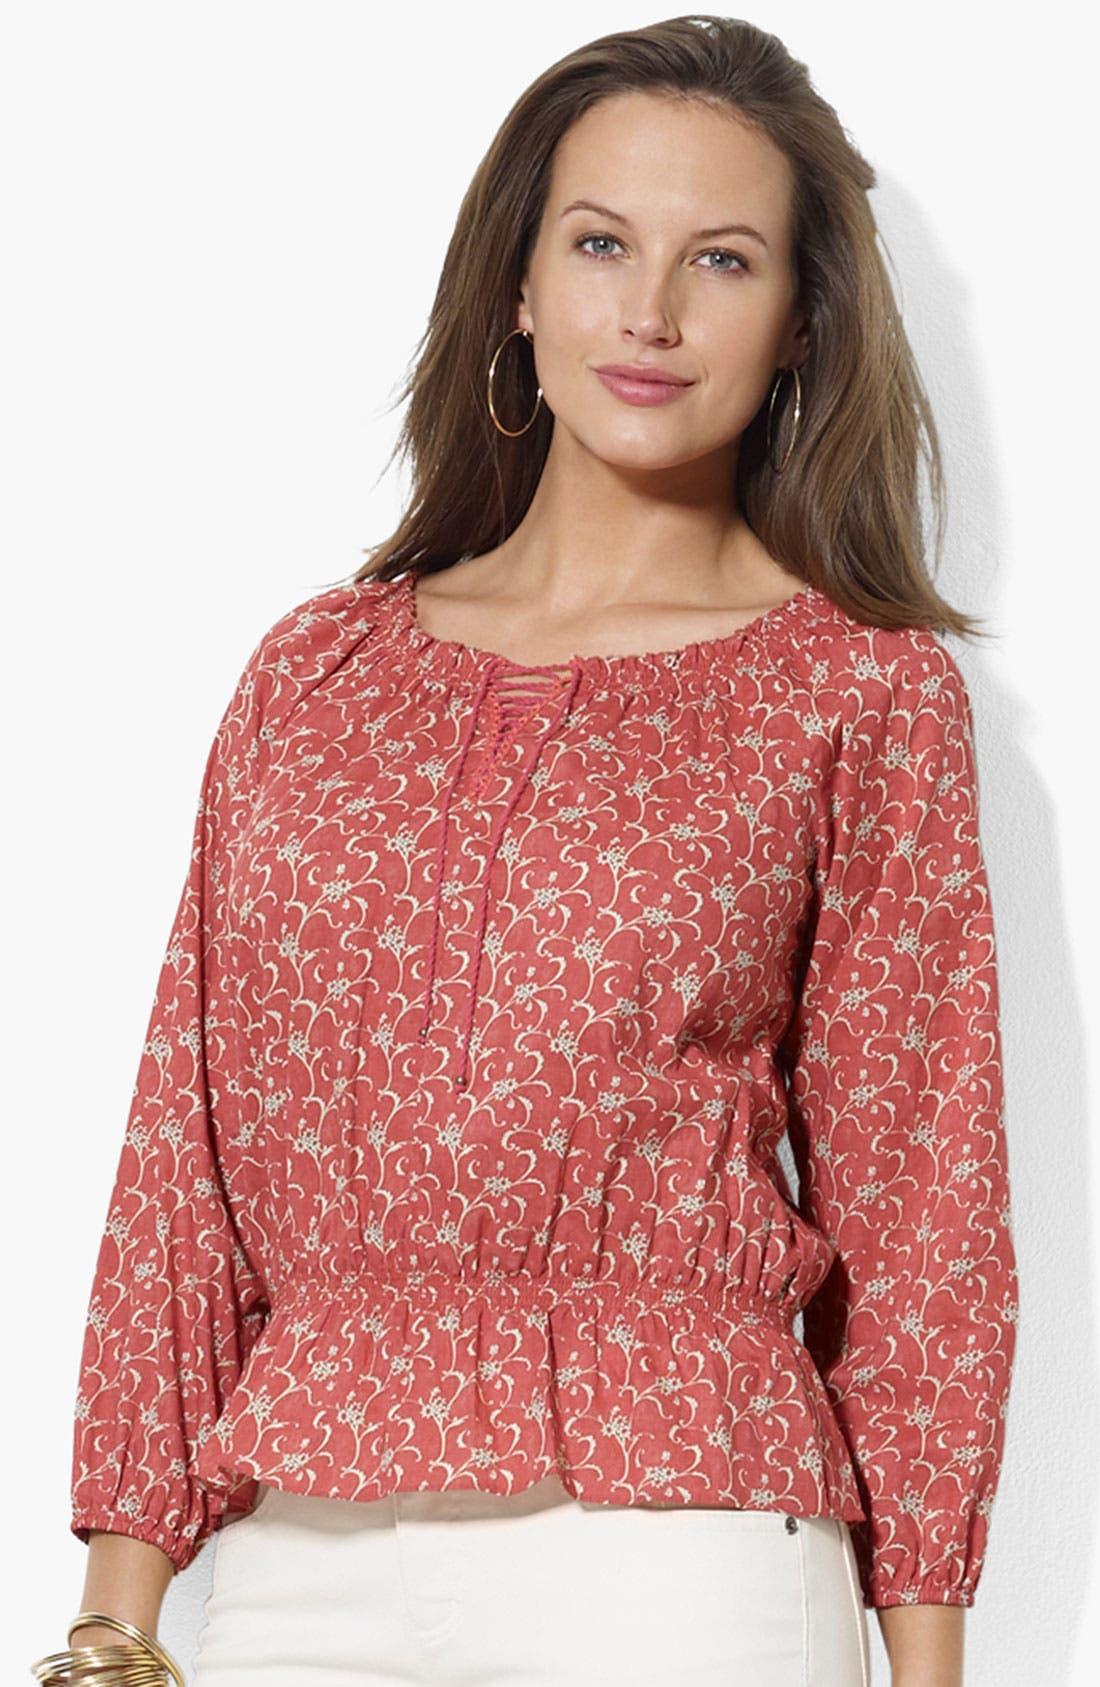 Alternate Image 1 Selected - Lauren Ralph Lauren Print Lace Up Peasant Top (Plus Size)